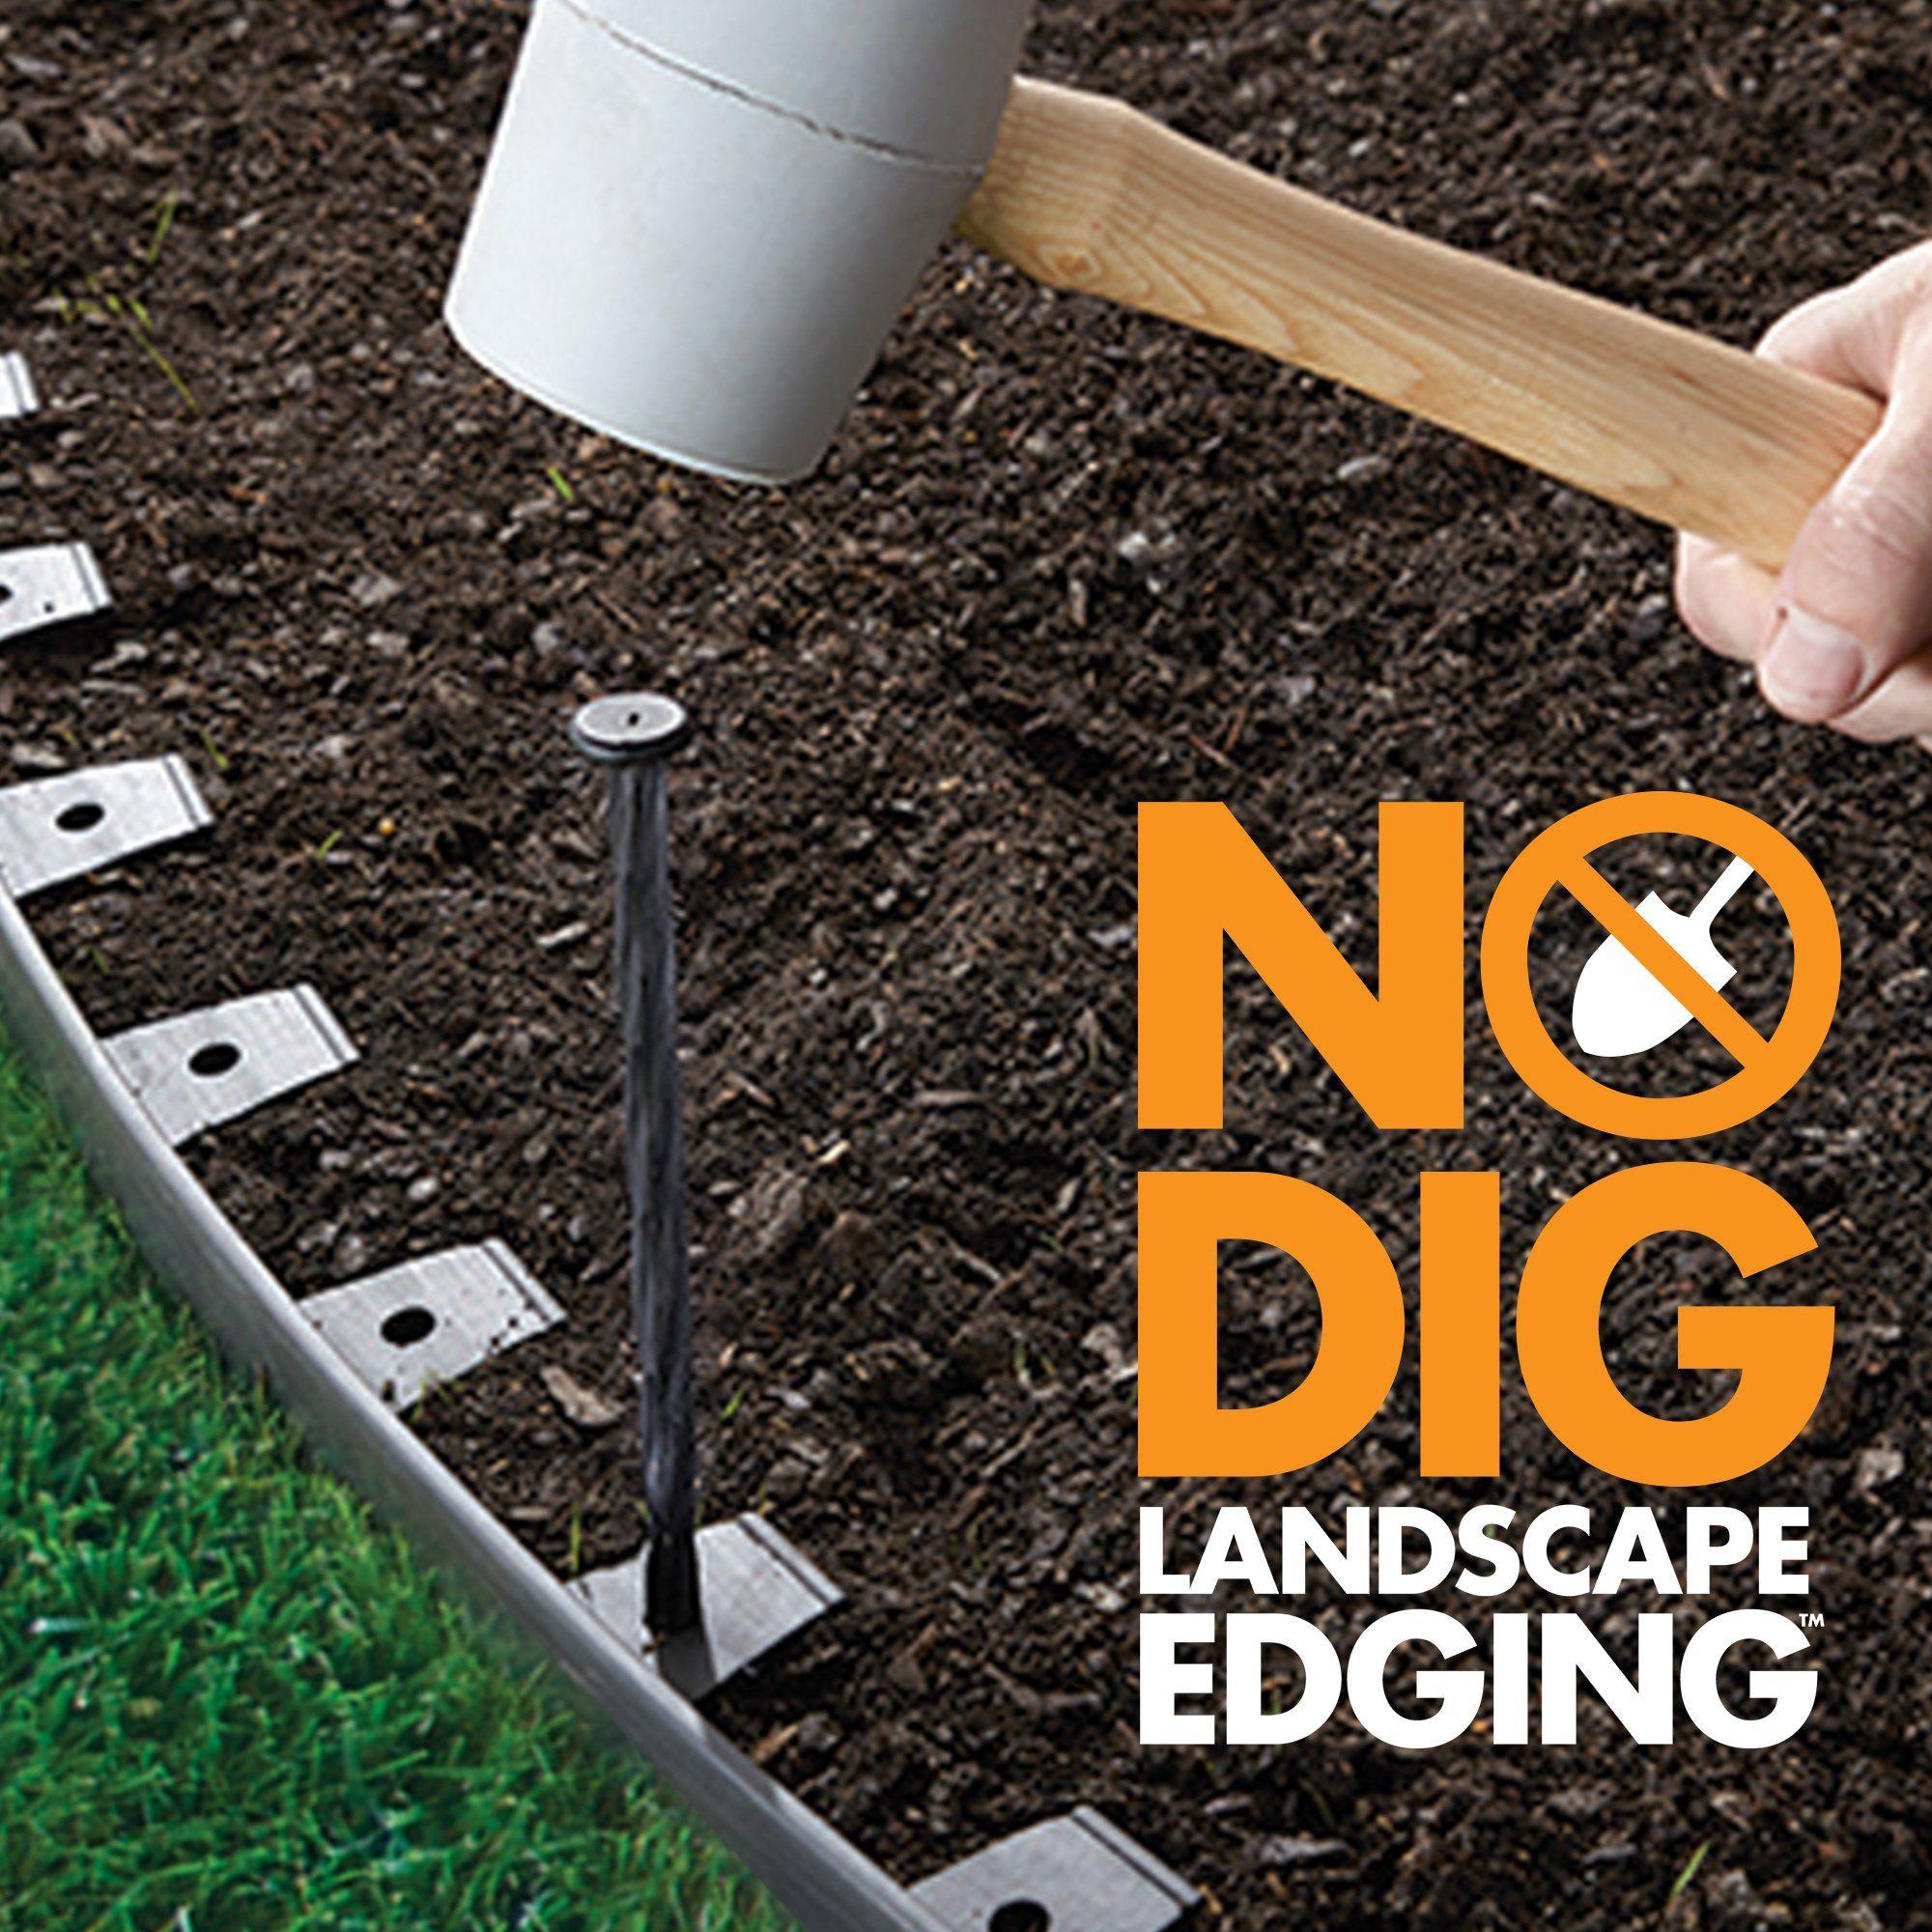 Dimex Easyflex Plastic No Dig Landscape Edging Kit Read More At